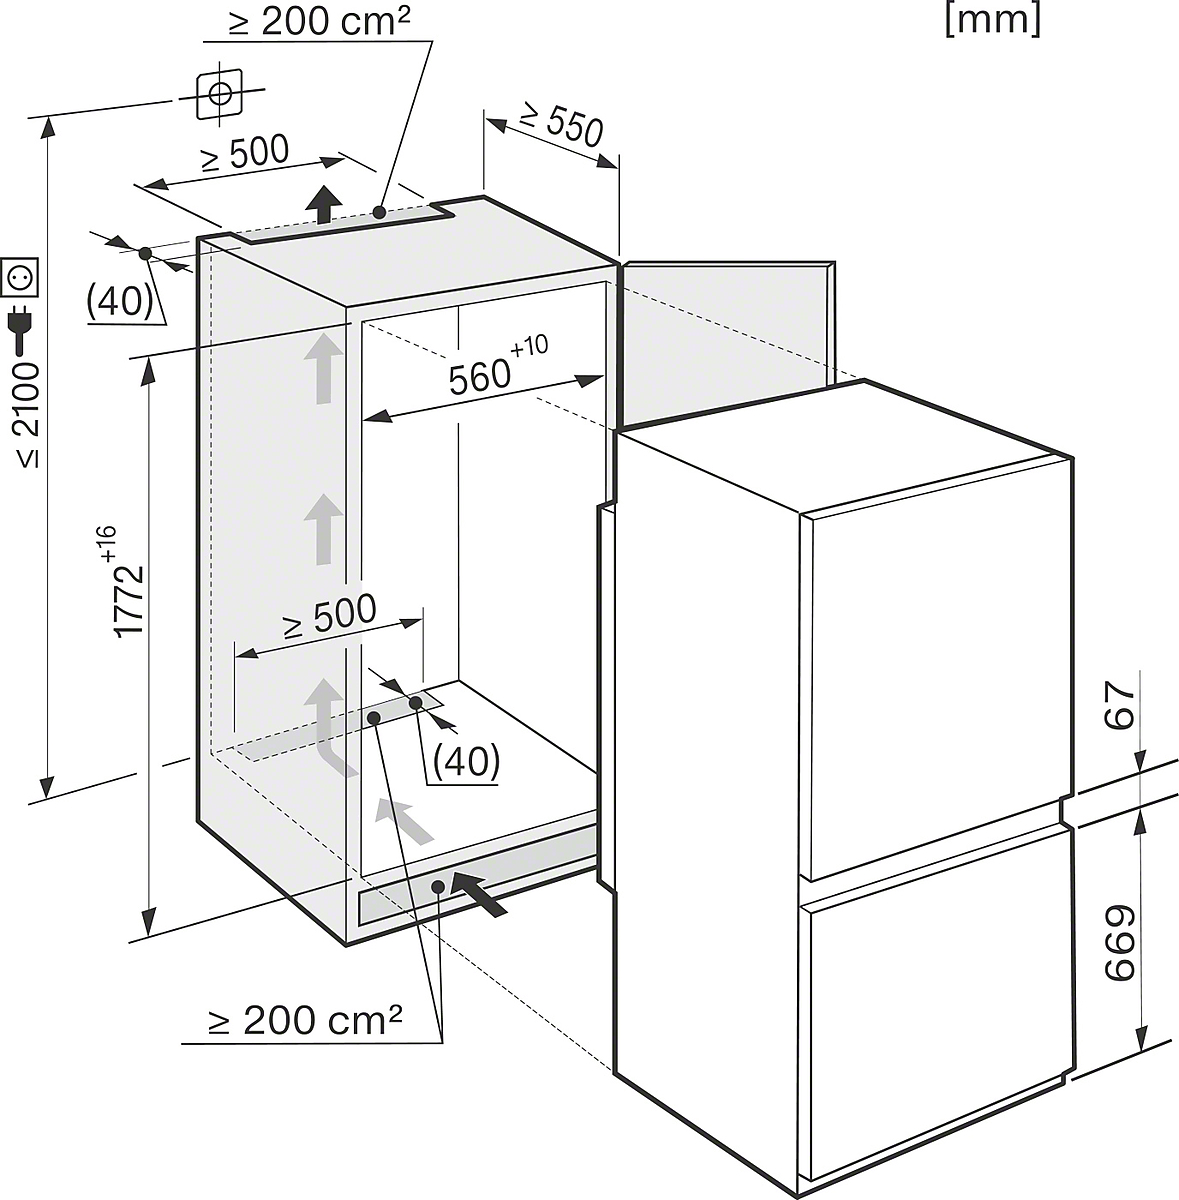 miele k hl gefrier kombination kf 37132 id vs elektro. Black Bedroom Furniture Sets. Home Design Ideas